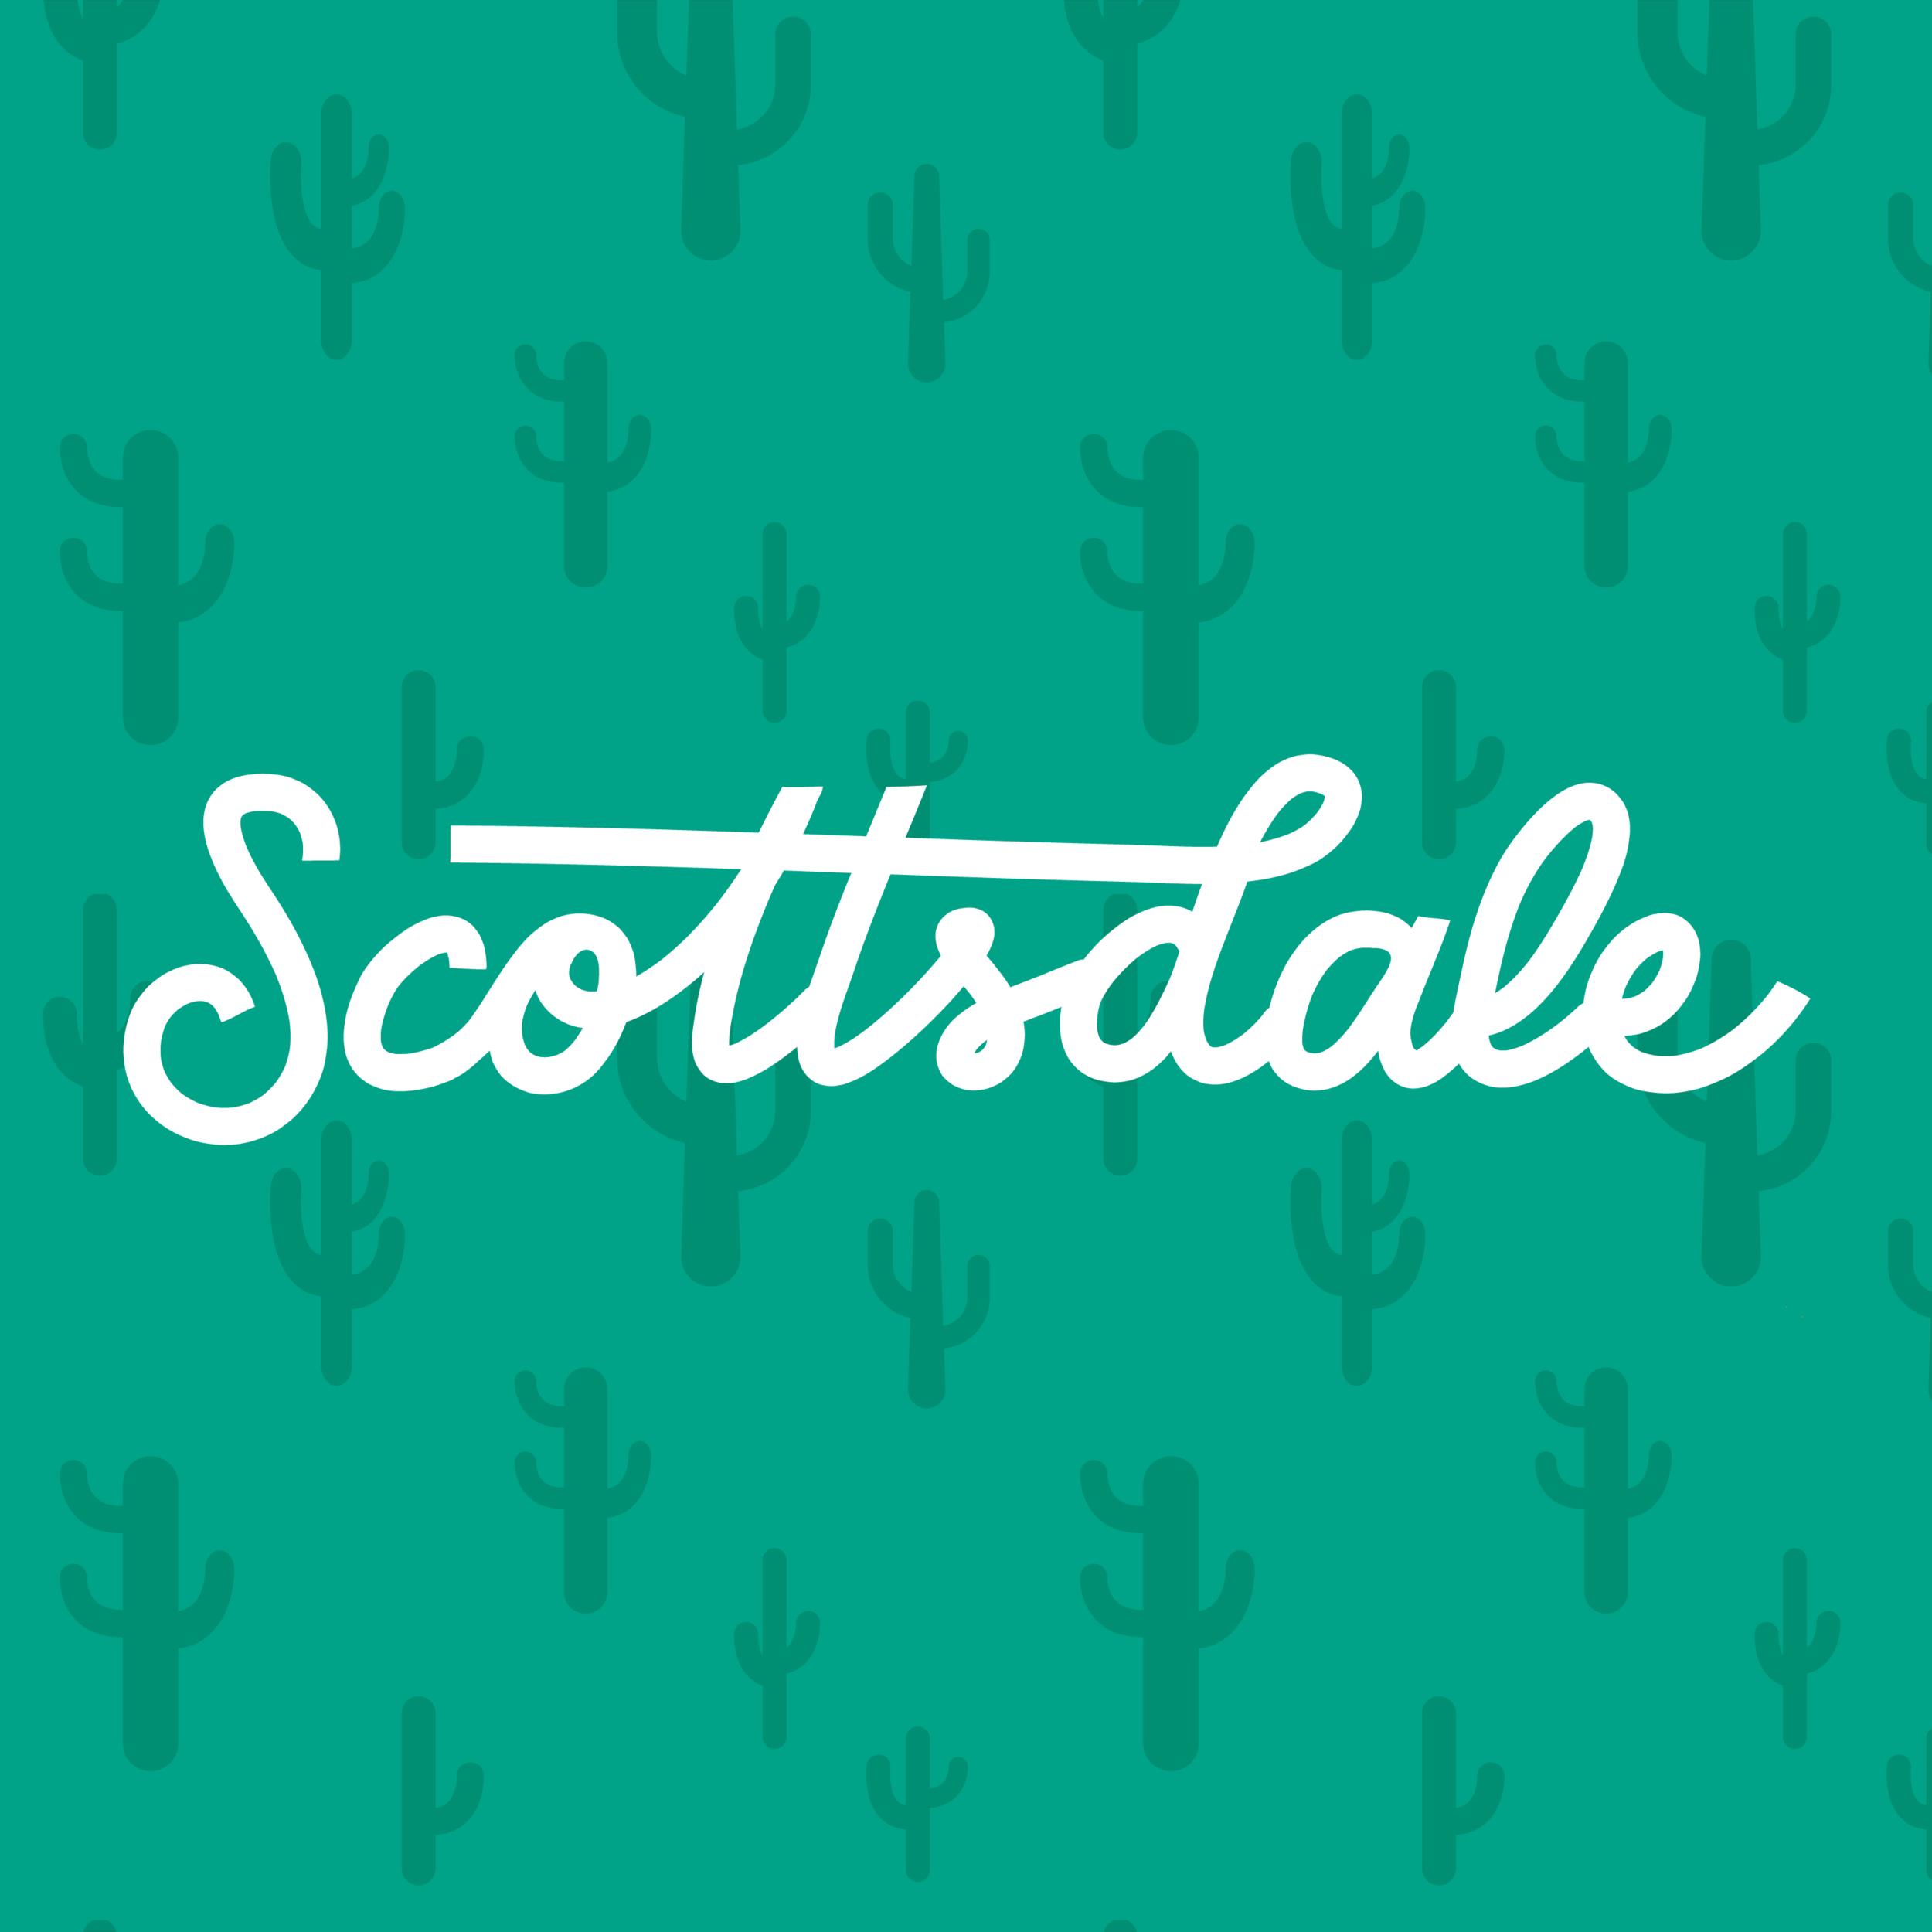 Scottsdale.png